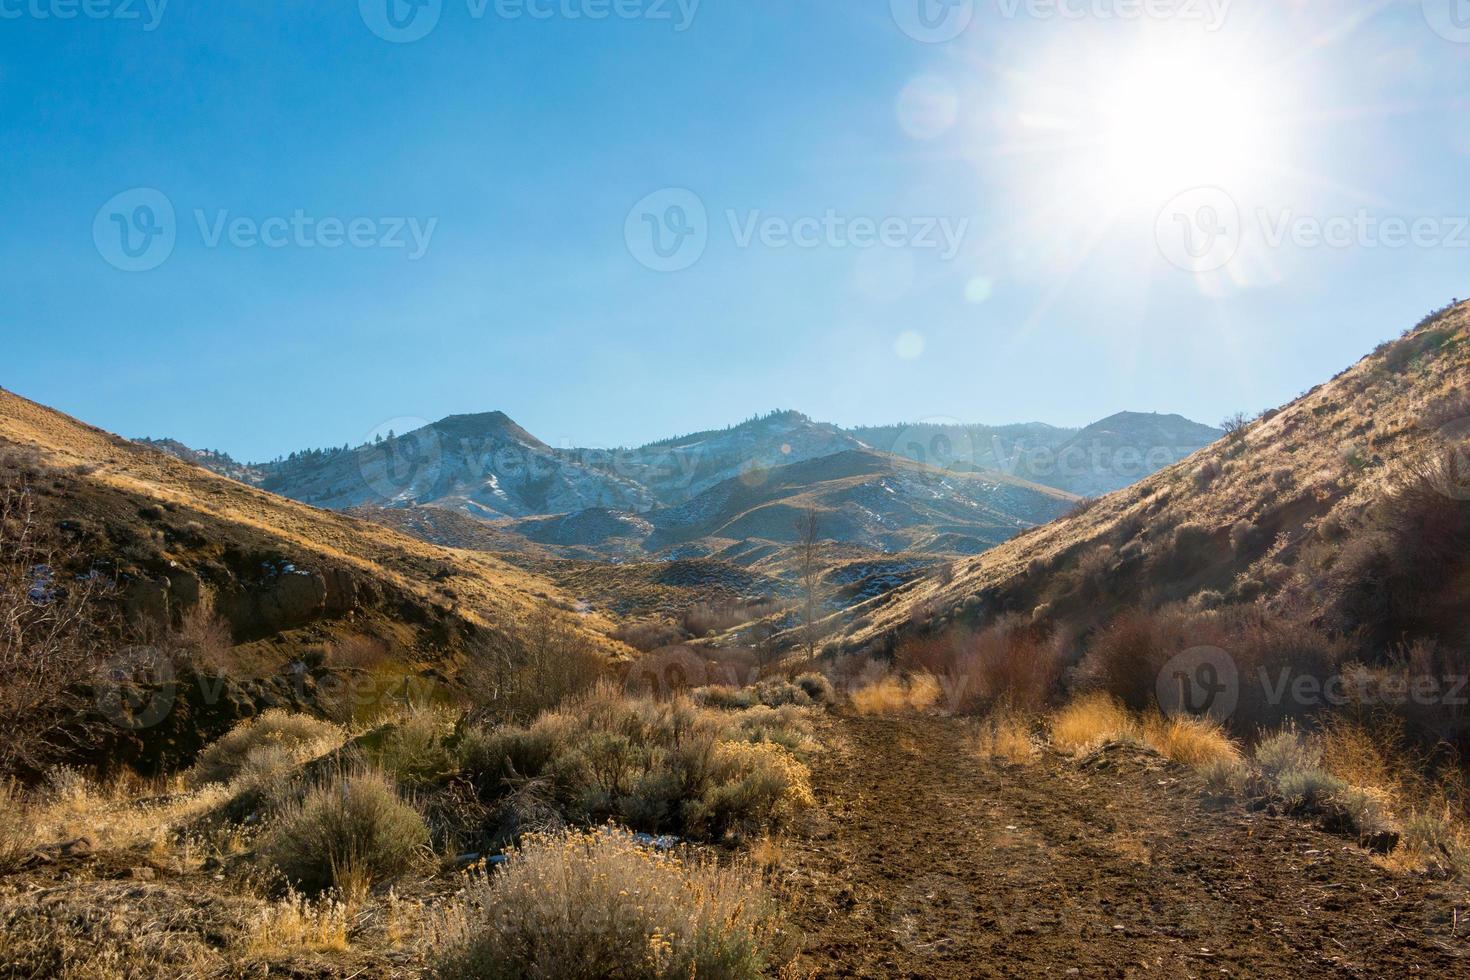 Sunburst Sierra Nevada bergen, woestijnlandschap foto